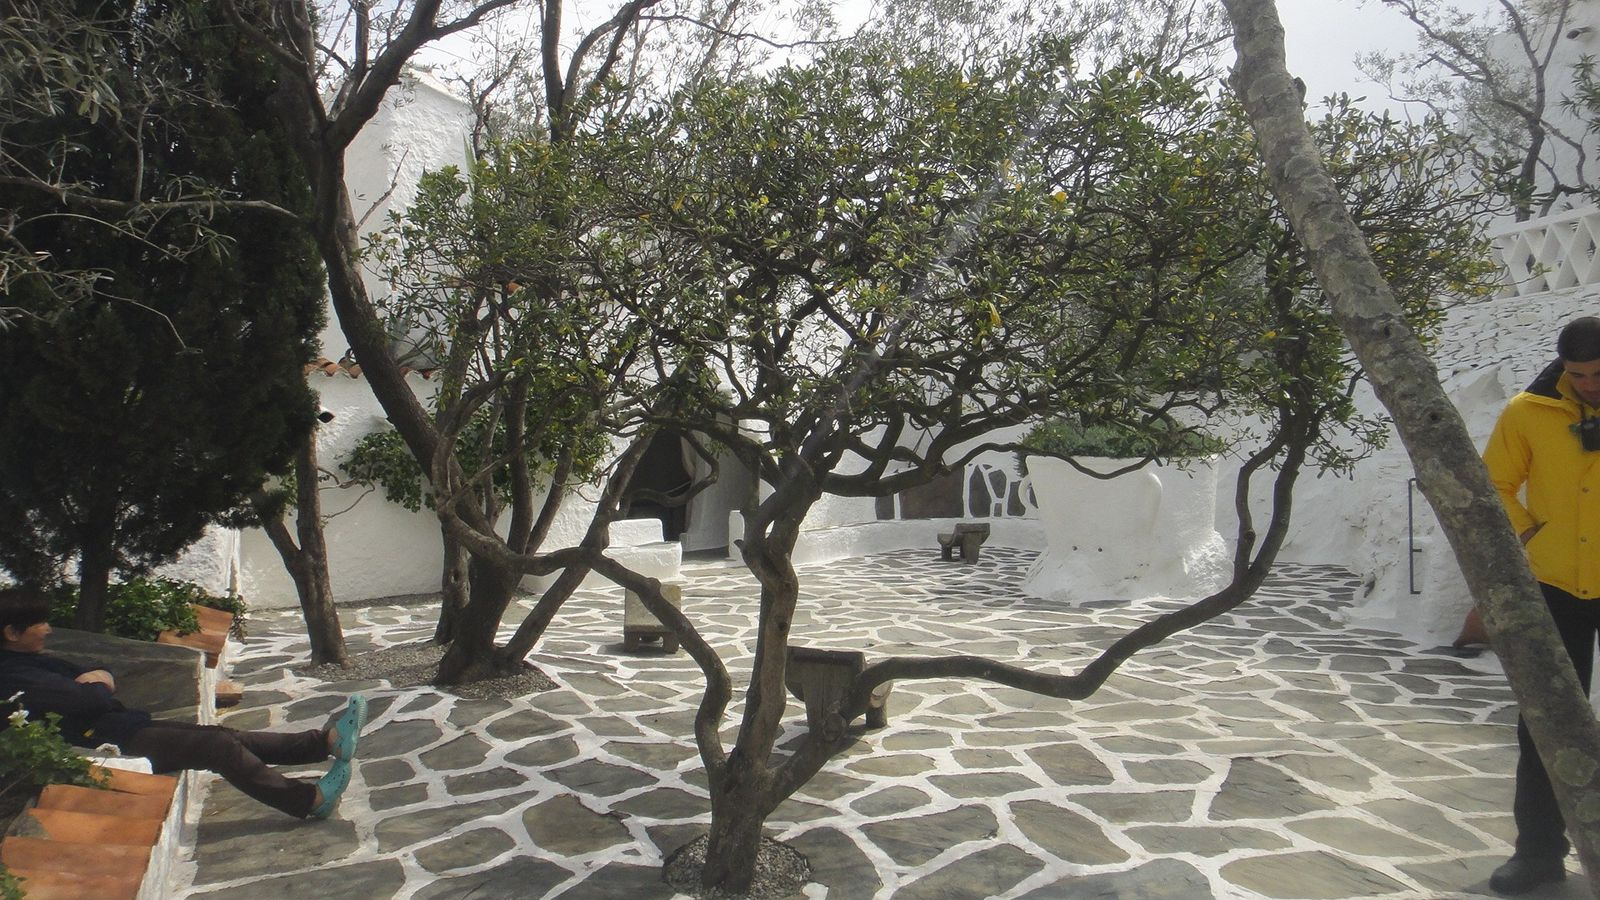 Pagaia 2013 : Portlligat - La maison de Dali - Cadaques (Espagne)